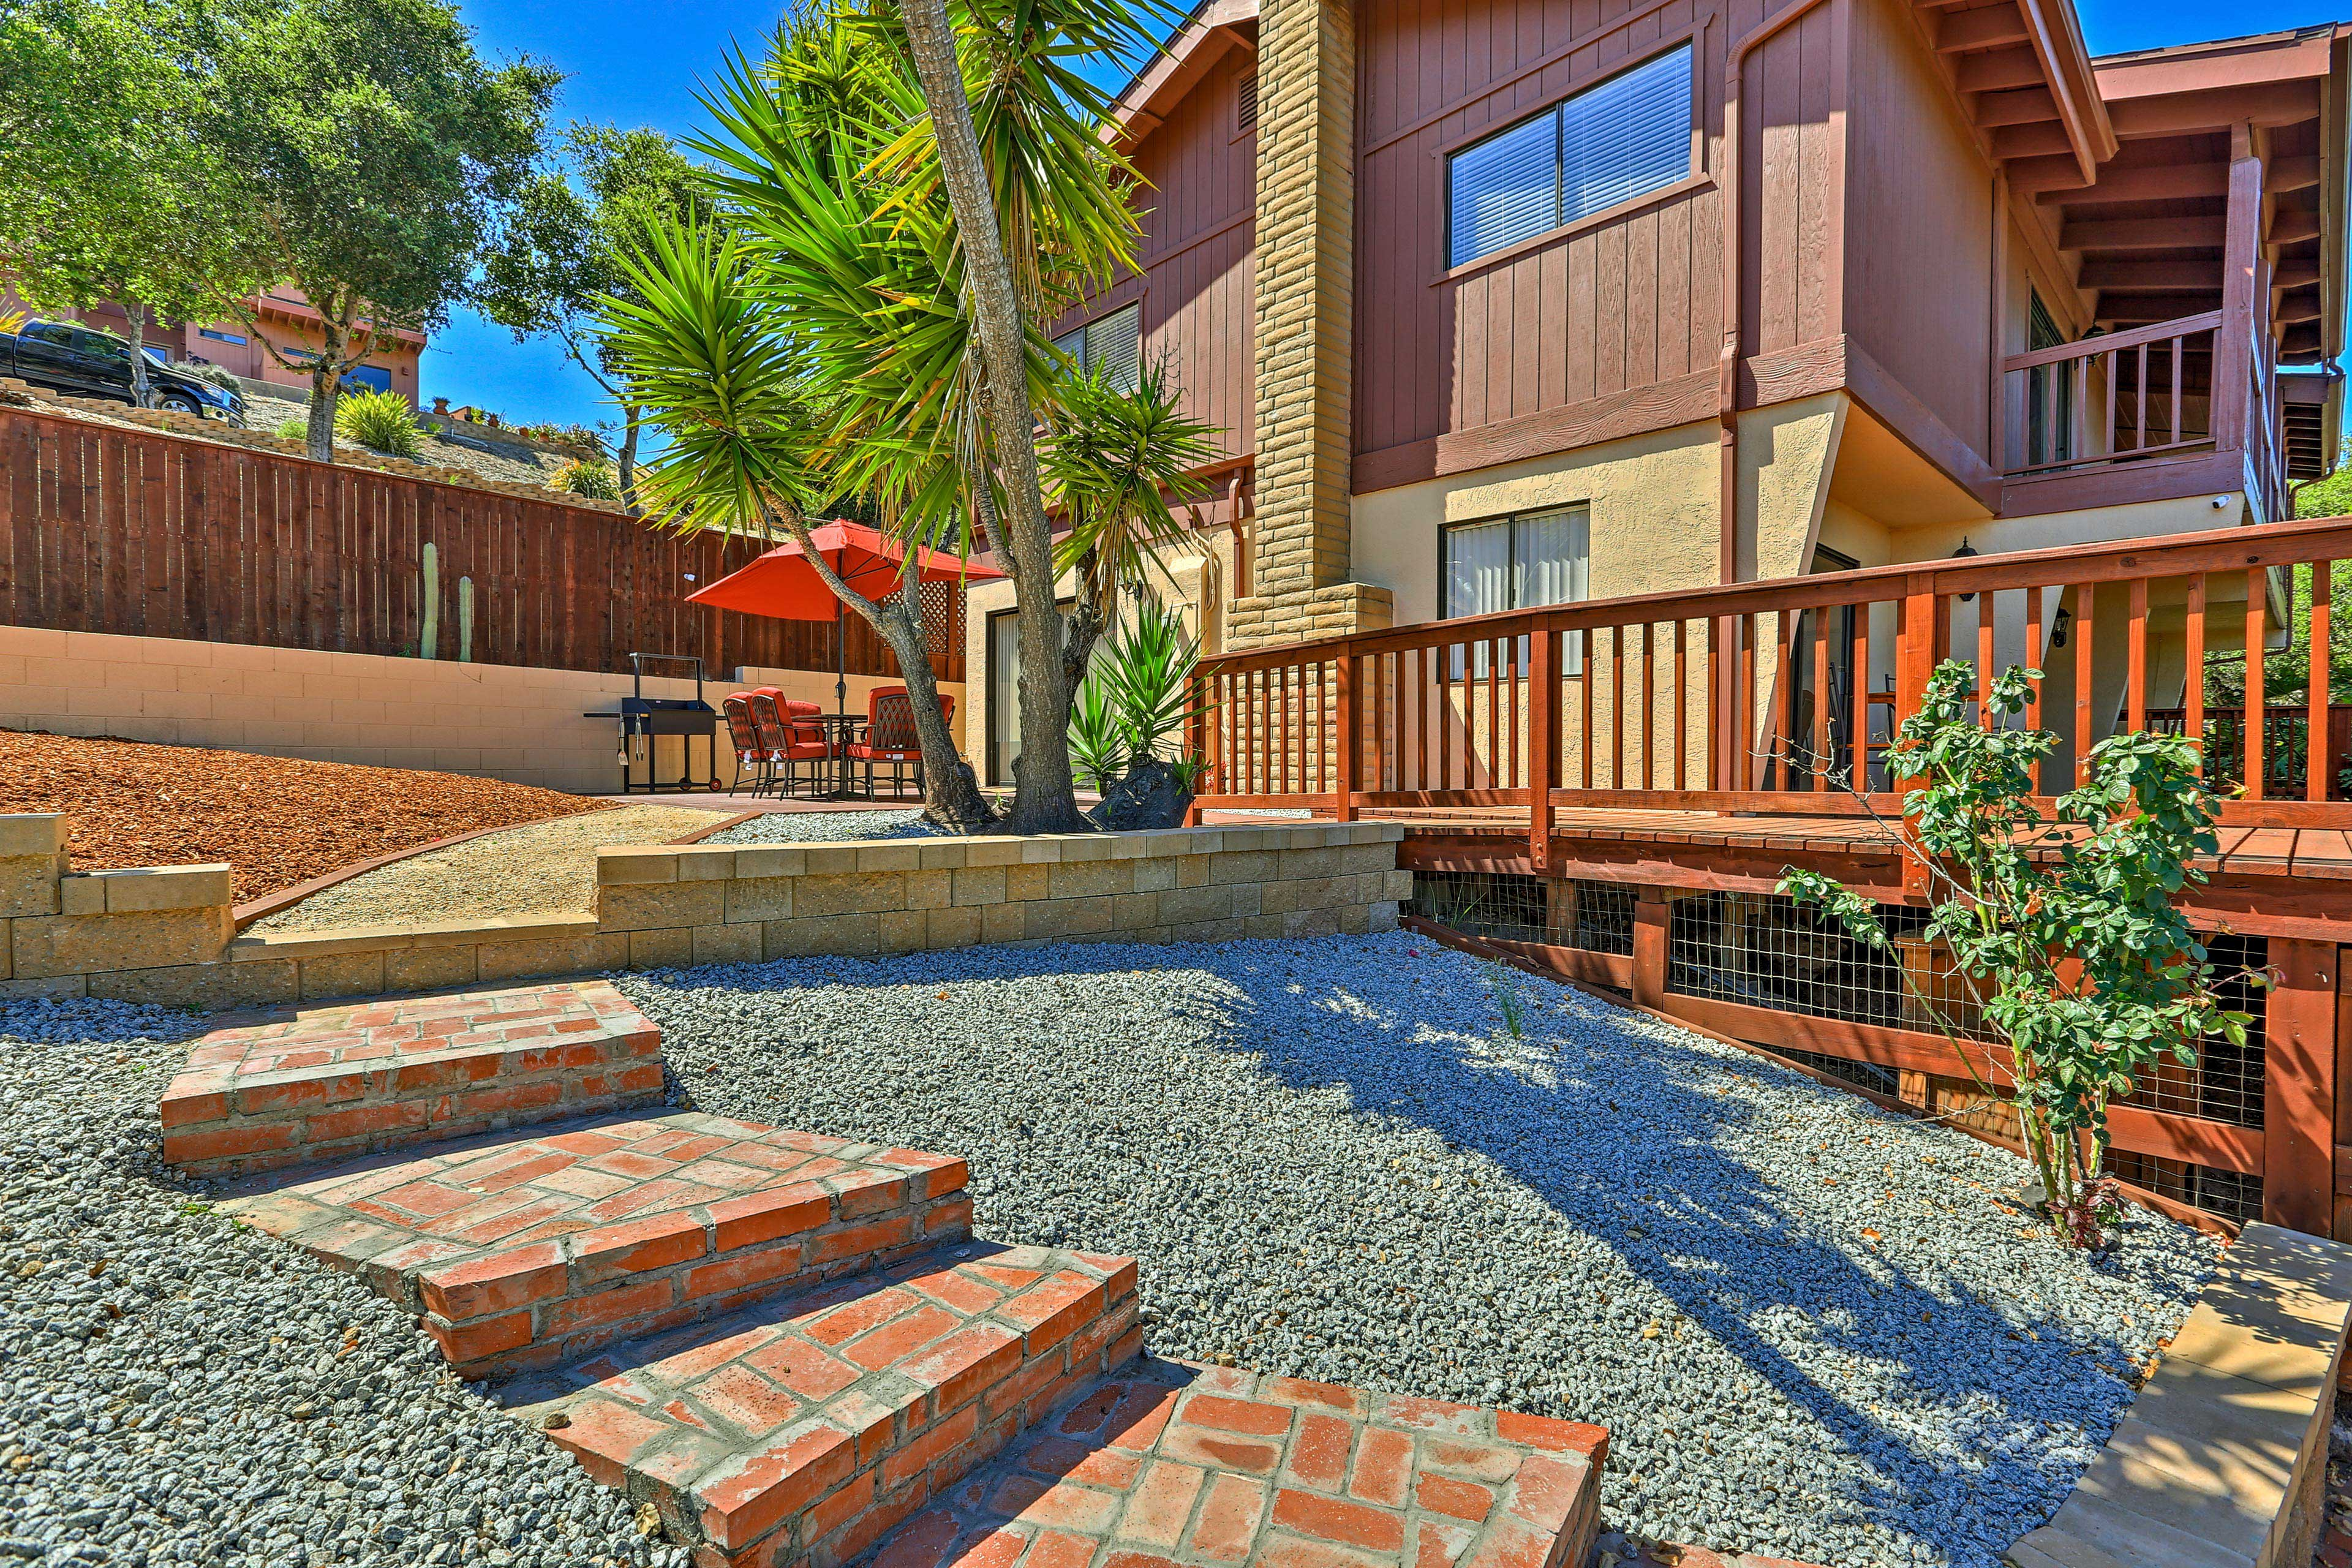 Elevate your Arroya Grande holiday at this 3-bedroom, 2.5 bath vacation rental!